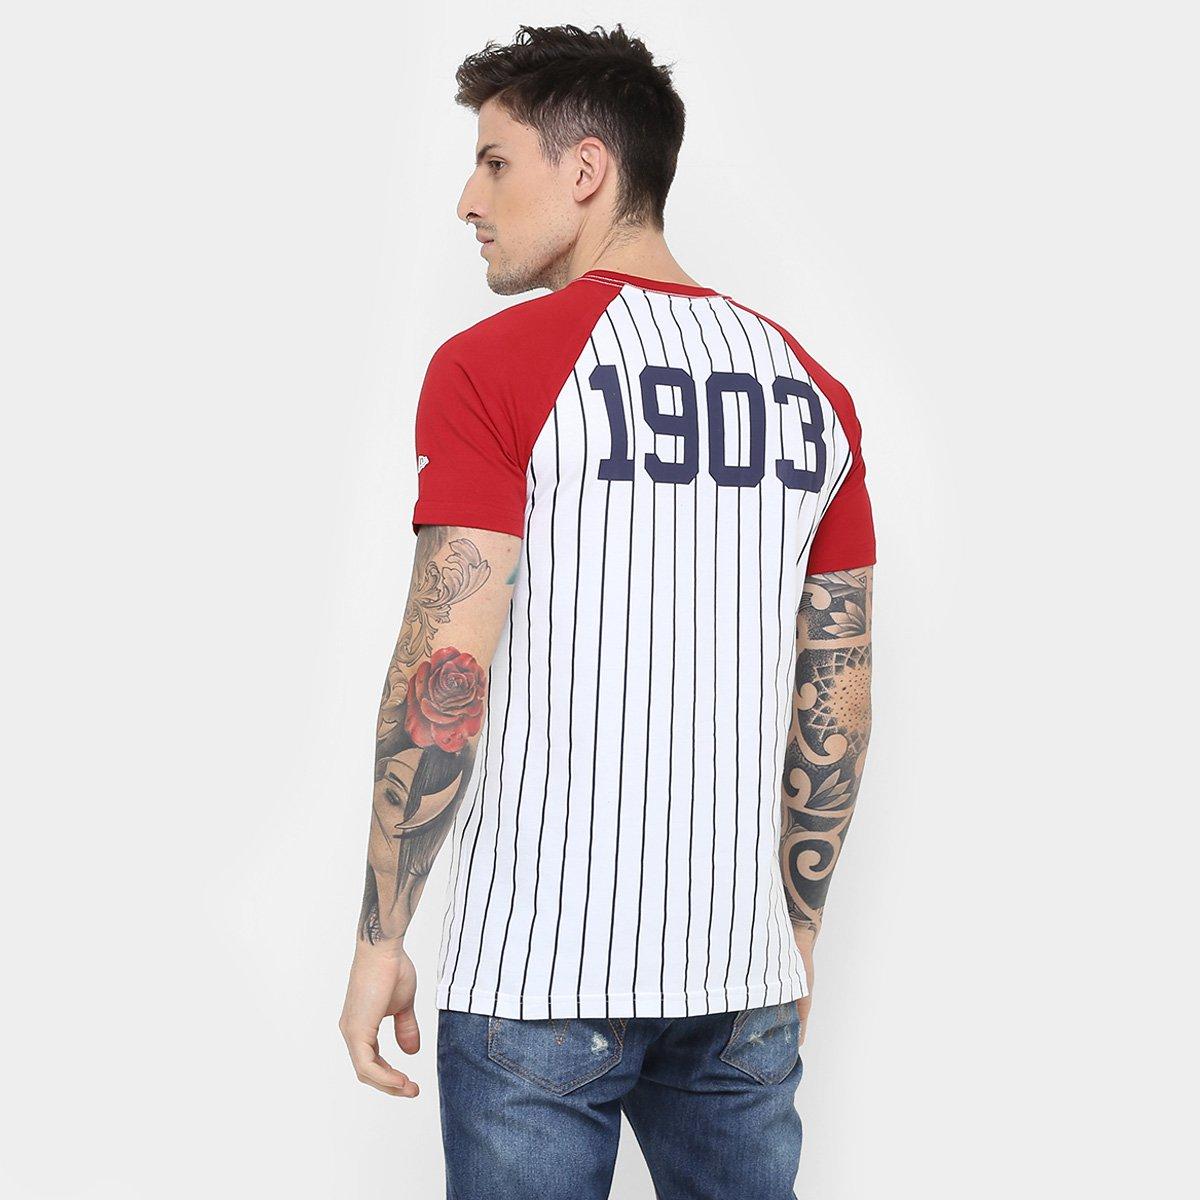 Camiseta New Era MLB Team 34 New York Yankees - Compre Agora  3d106ceb1b7